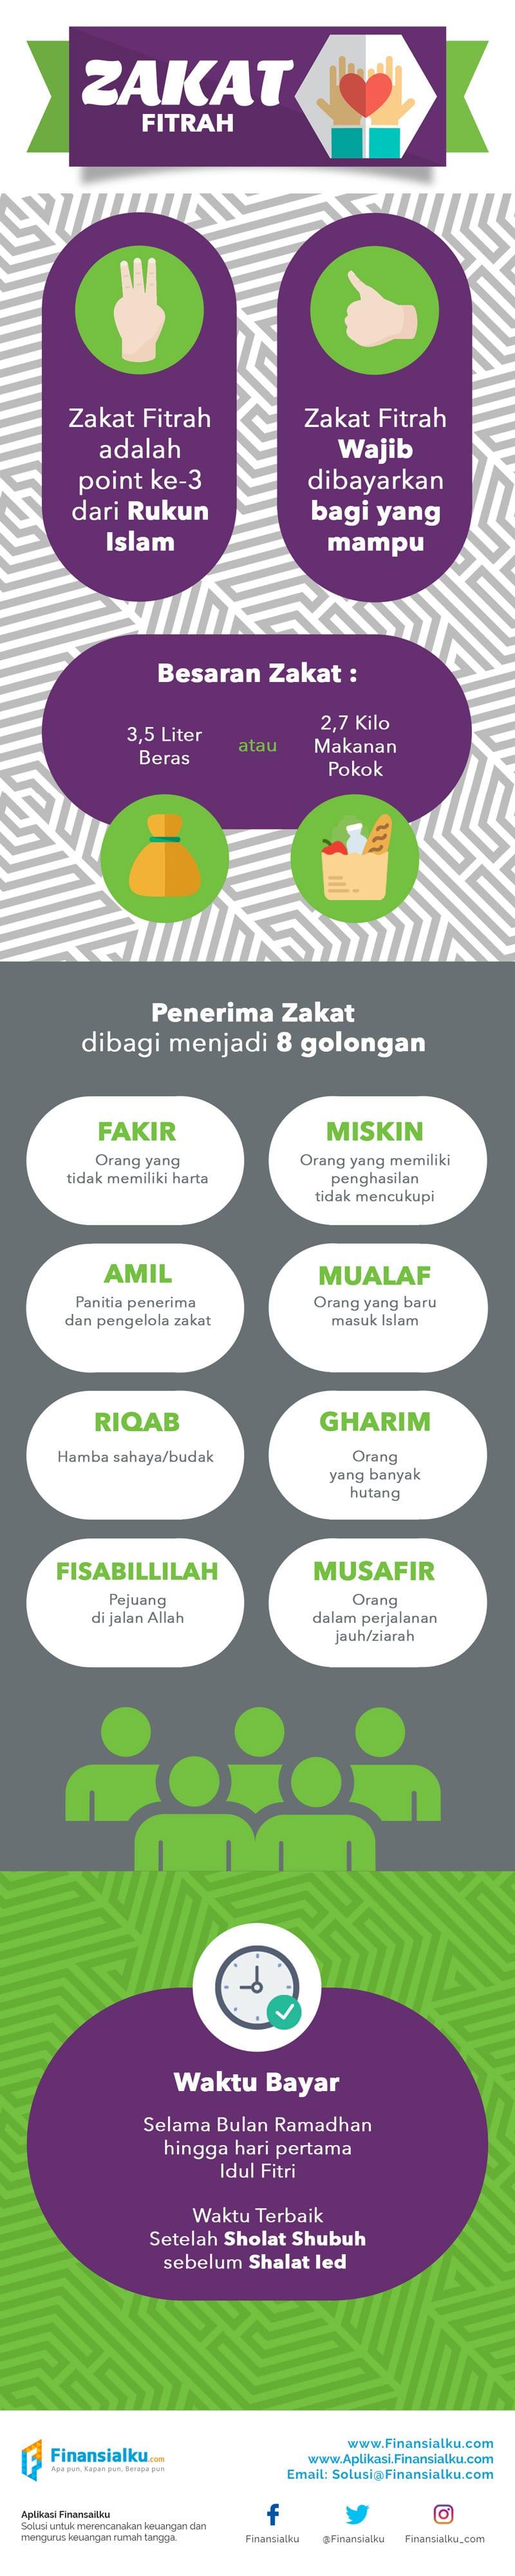 Infografis Zakat Fitrah